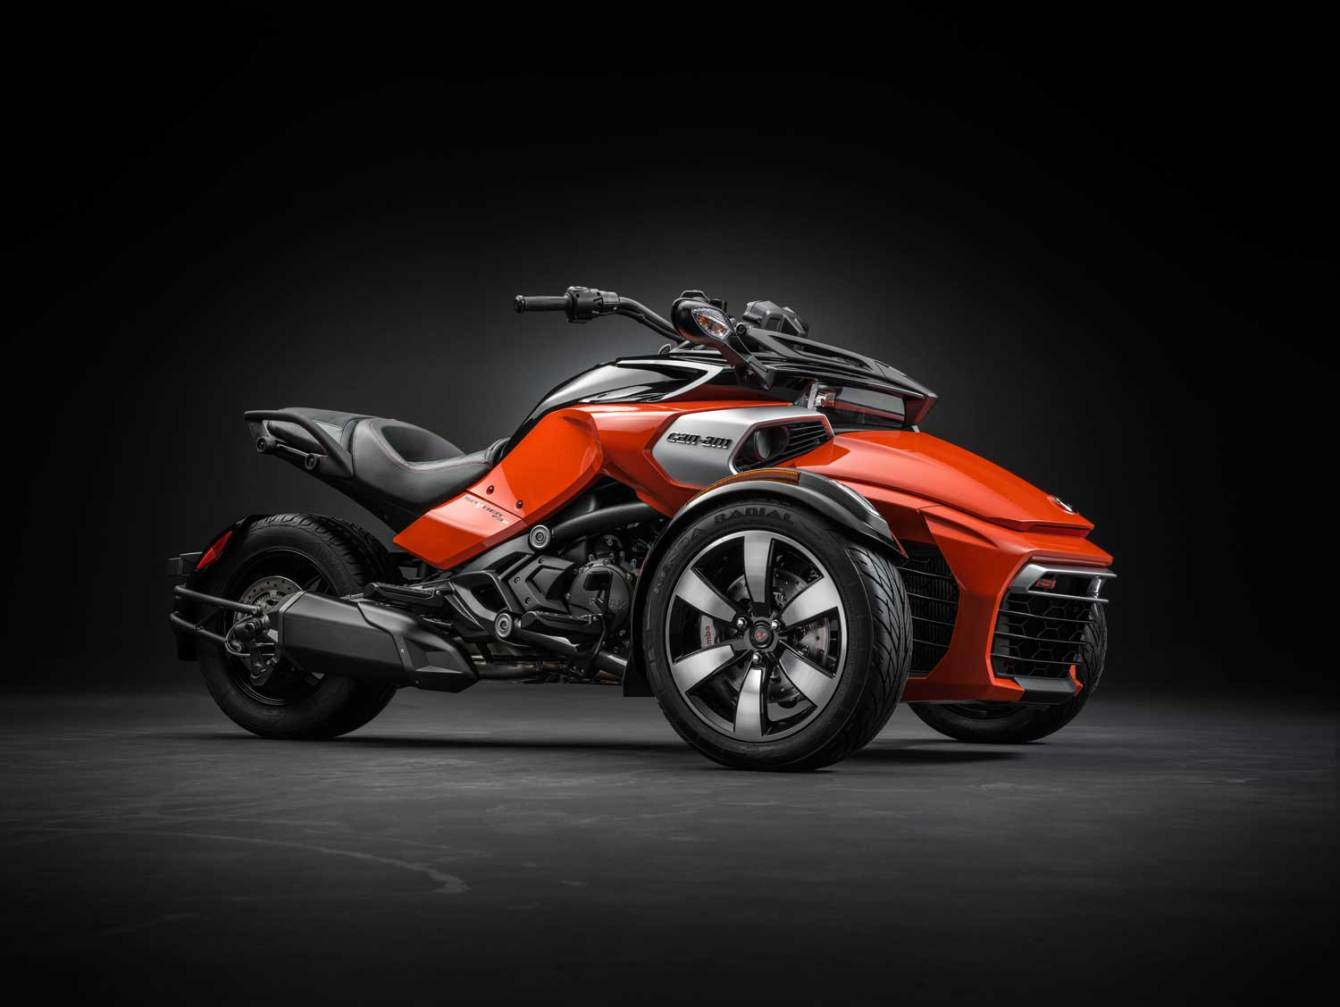 2015-Can-Am-Spyder-F3-003